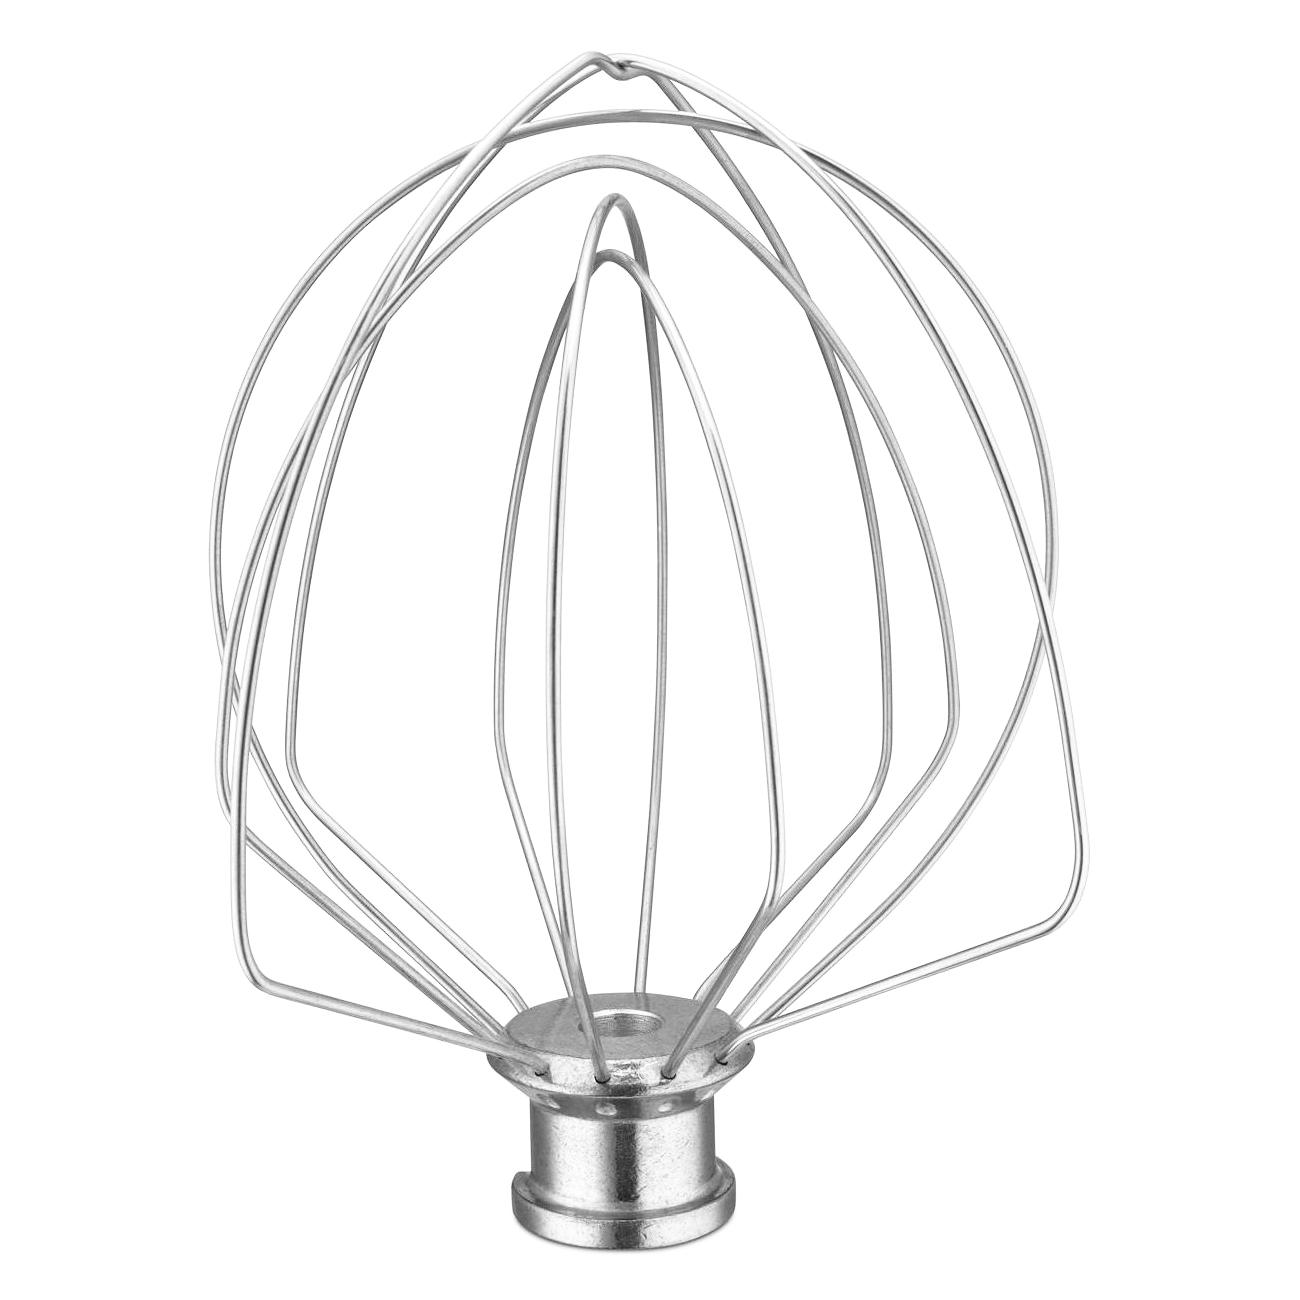 KitchenAid 6 Wire Whip Bowl Lift Mixer Attachment